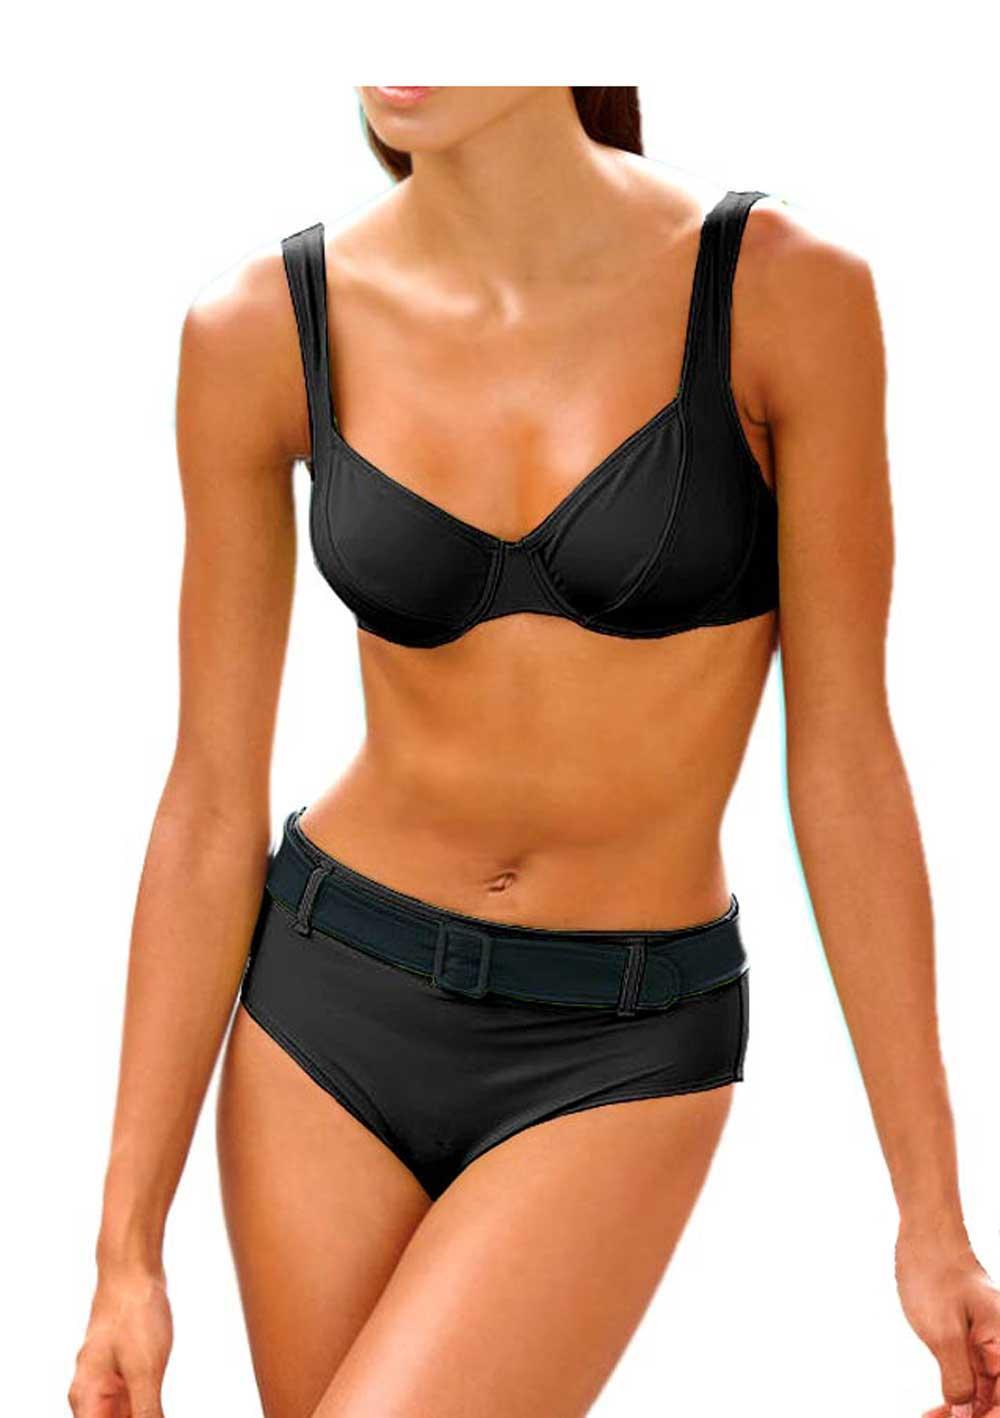 body shaping bikini schwarz schn ppchen outlet mode shop. Black Bedroom Furniture Sets. Home Design Ideas